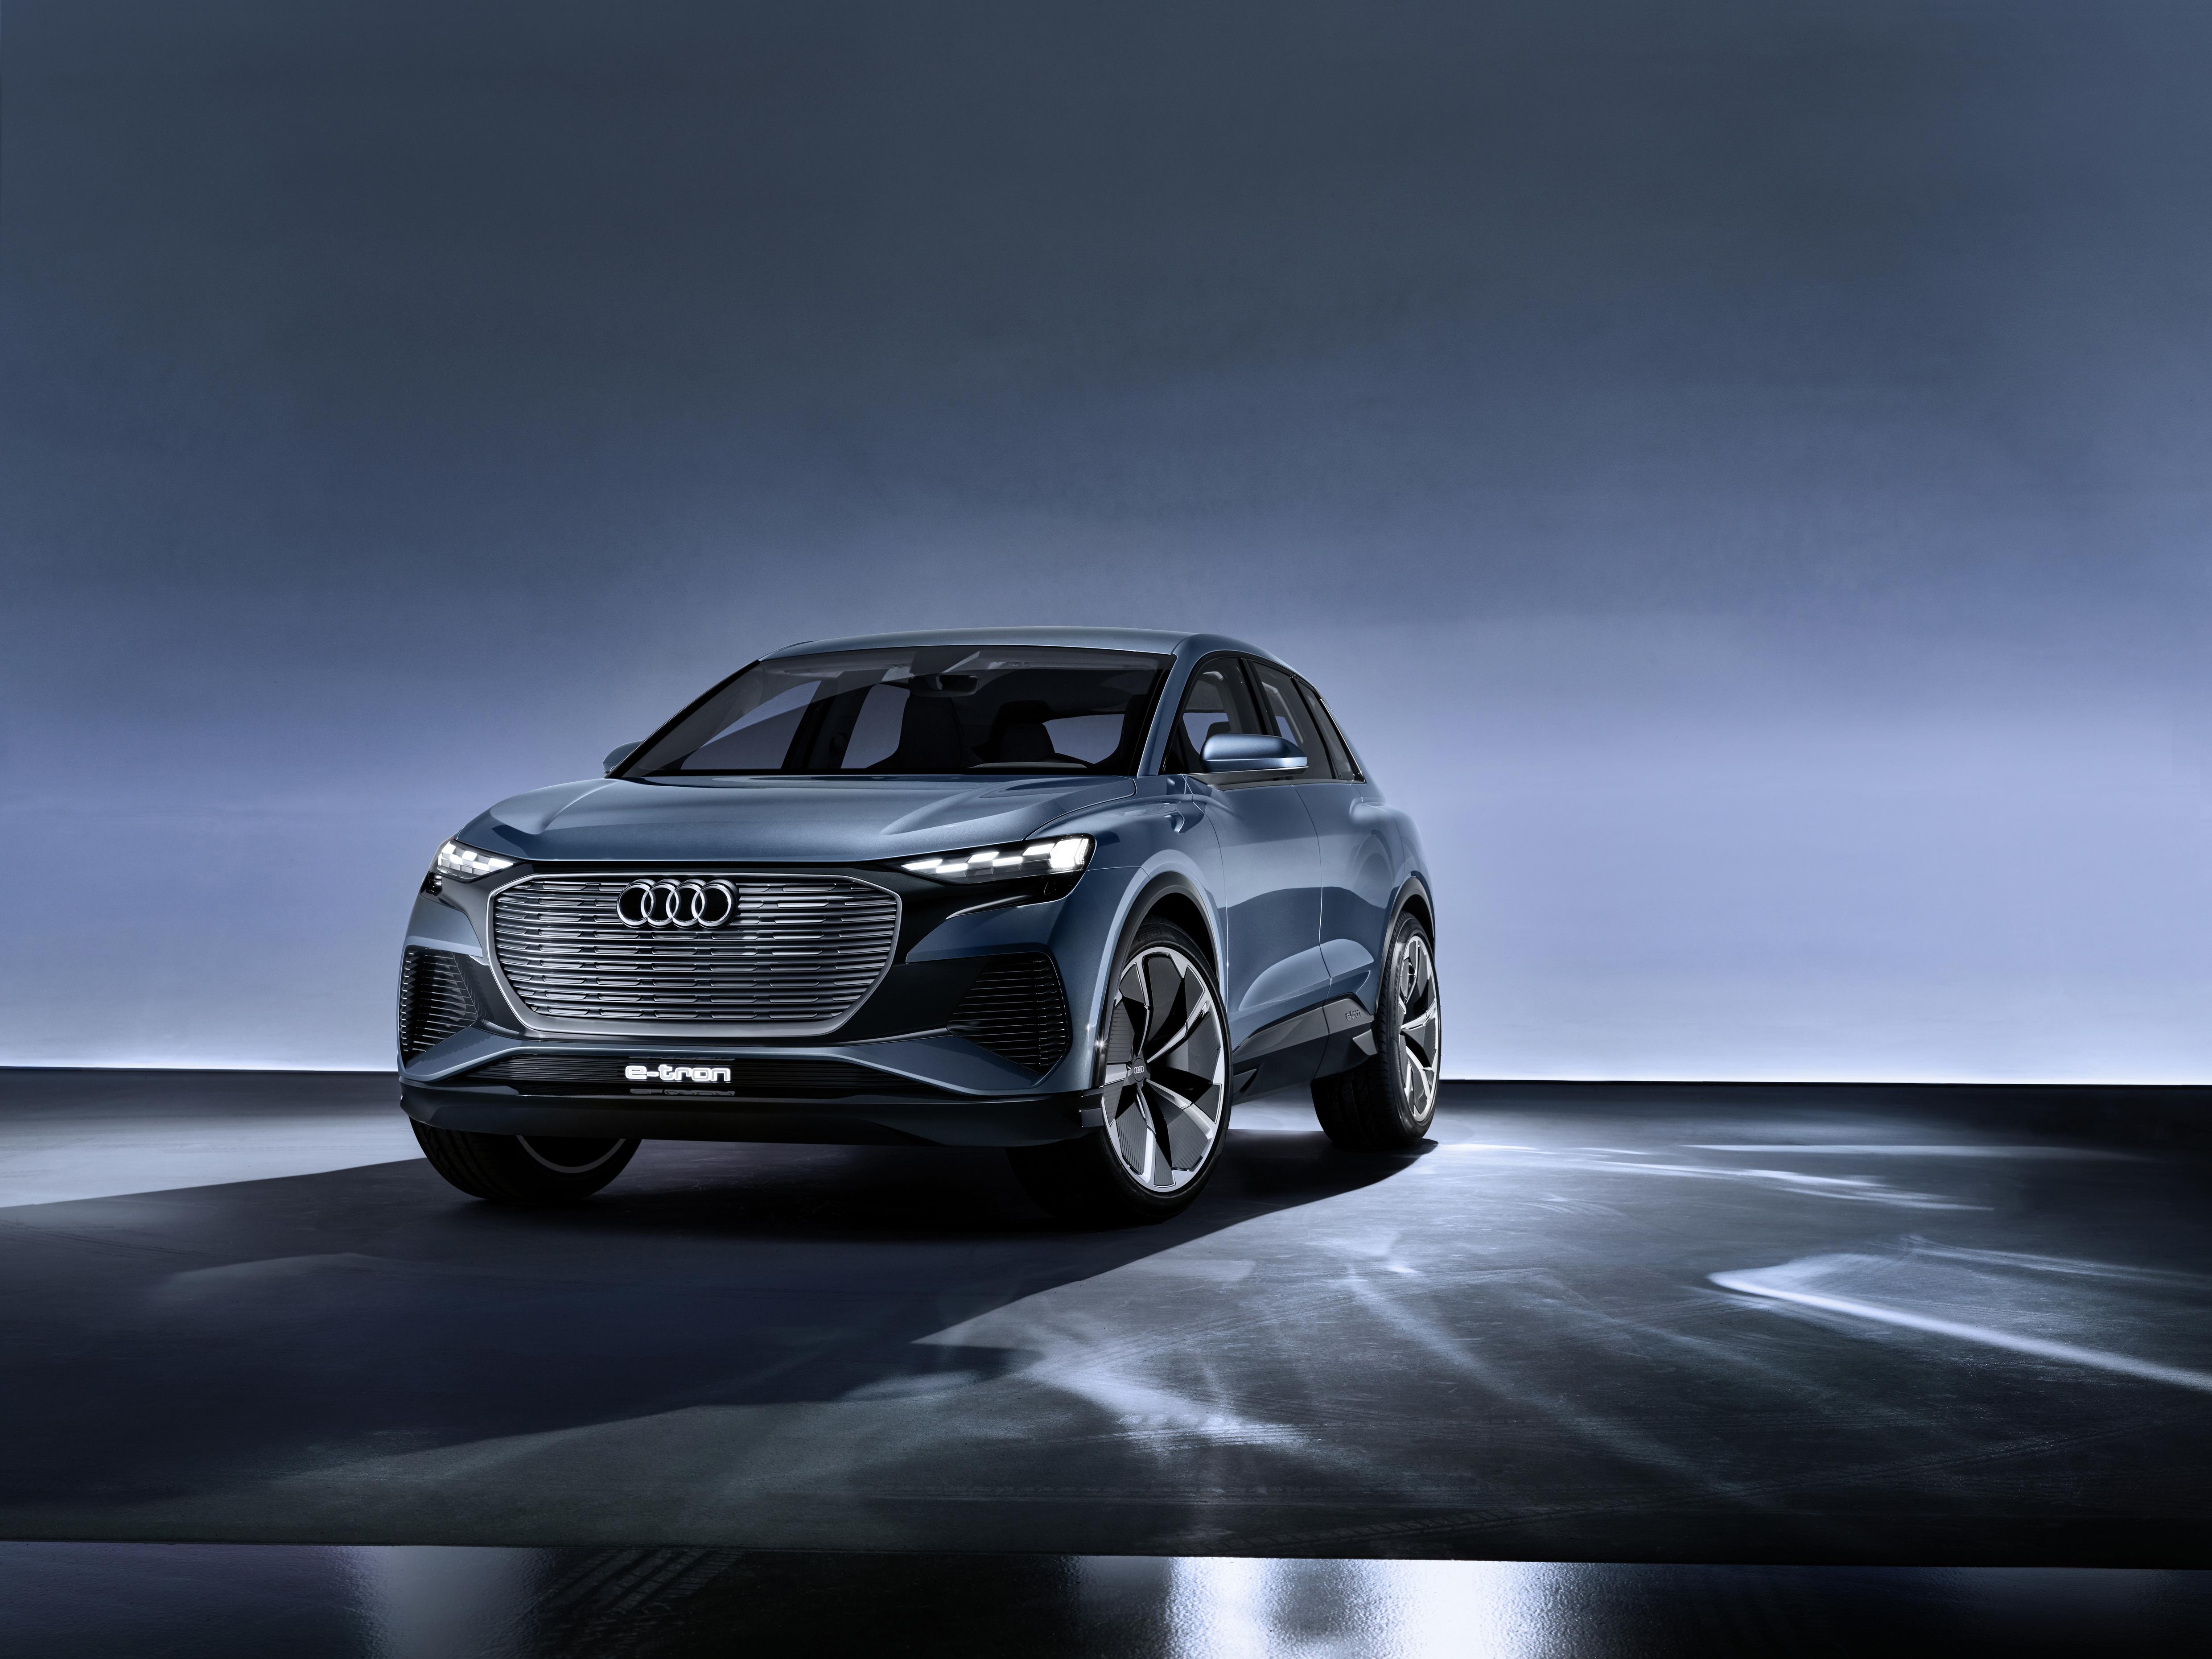 The Audi Q4 e-tron concept. Photo: Audi